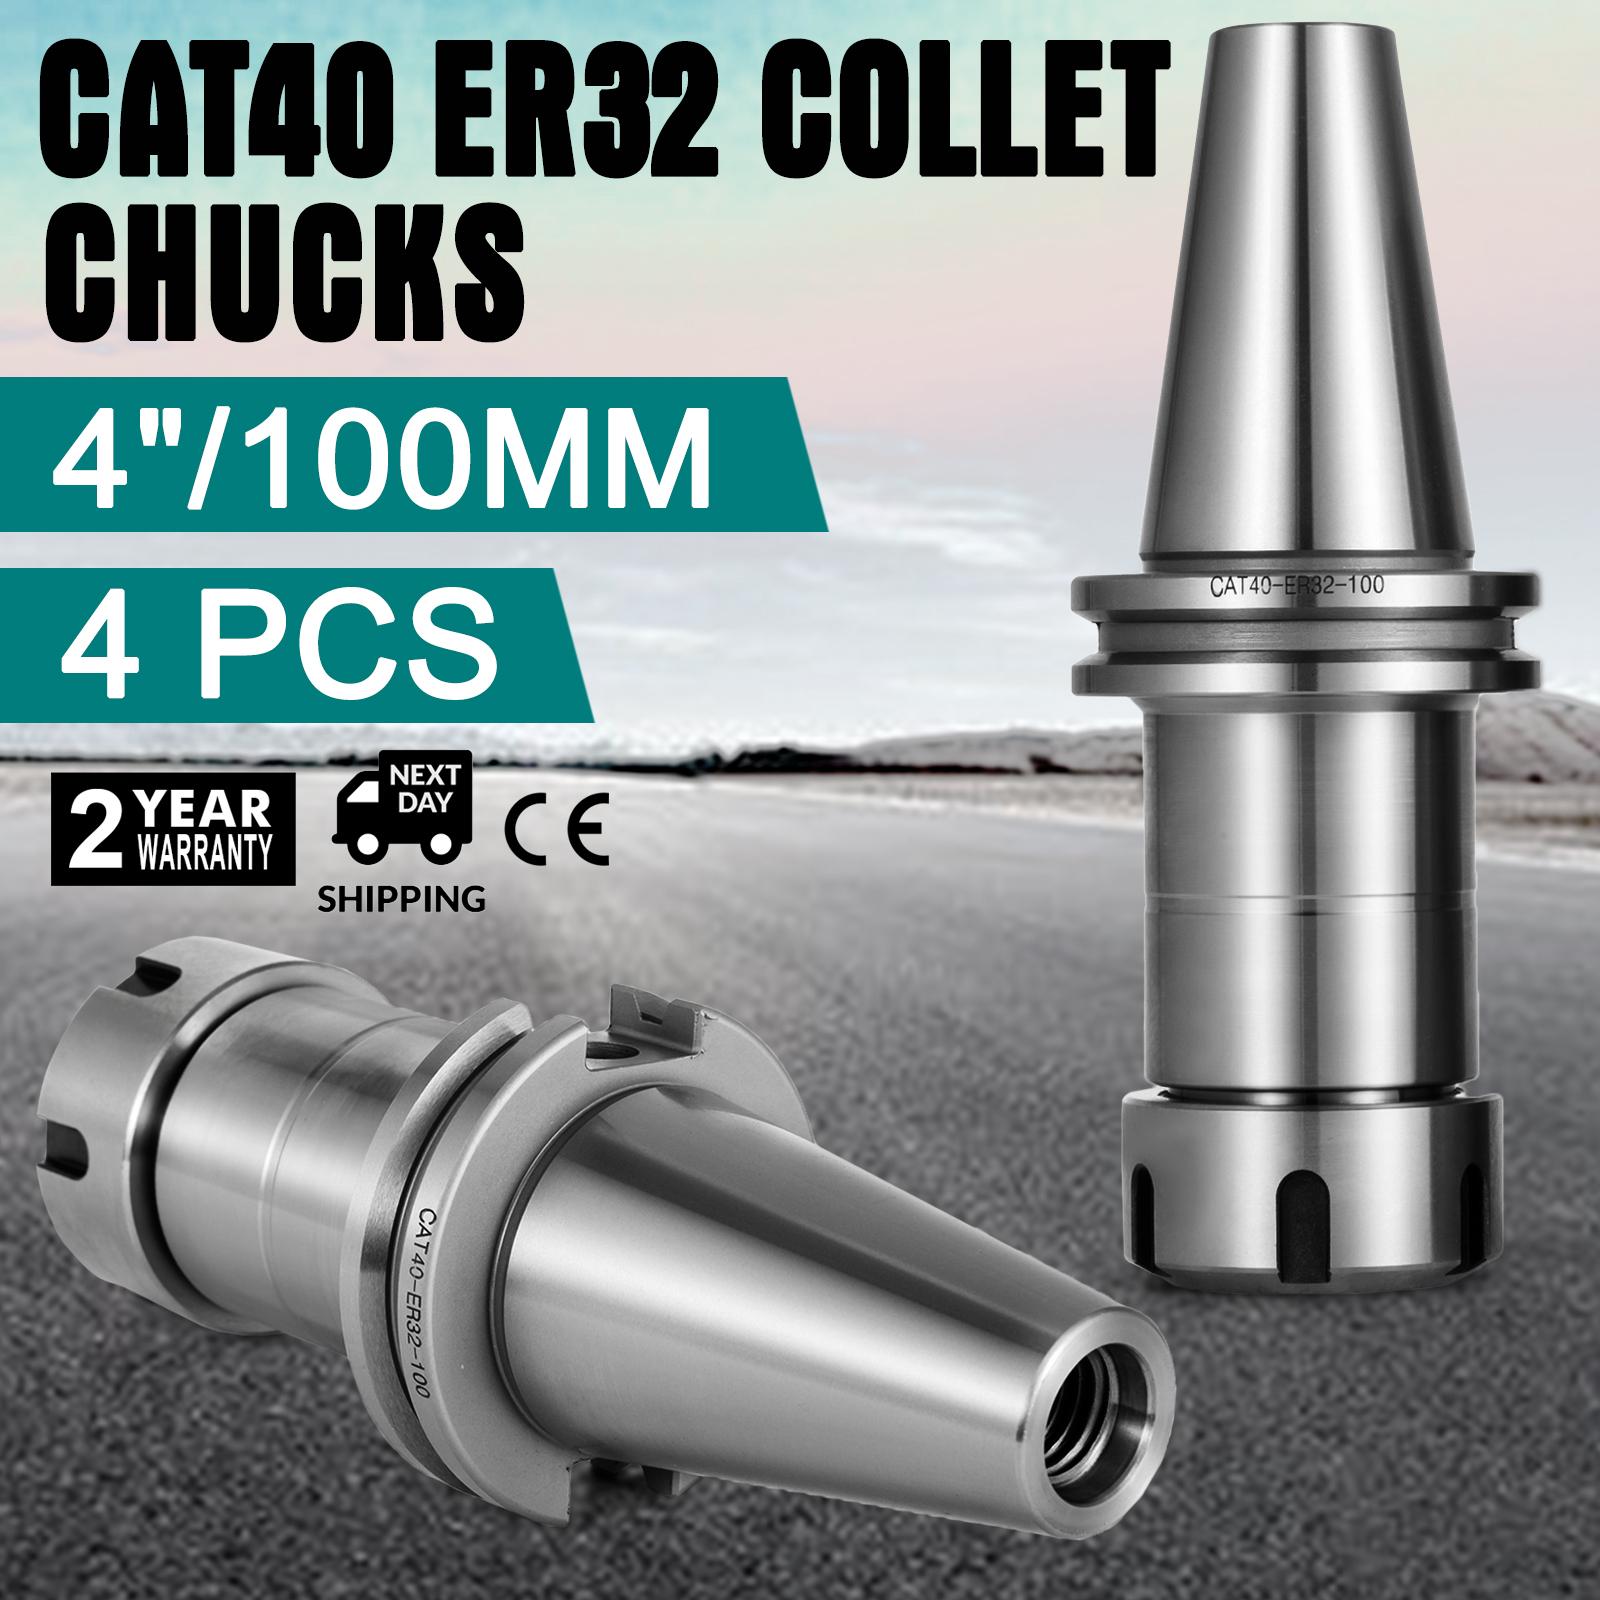 "4Pcs CAT40 ER32 COLLET CHUCKS W.4/"" Long Gage Length Tool Holder Pop Durable Good"